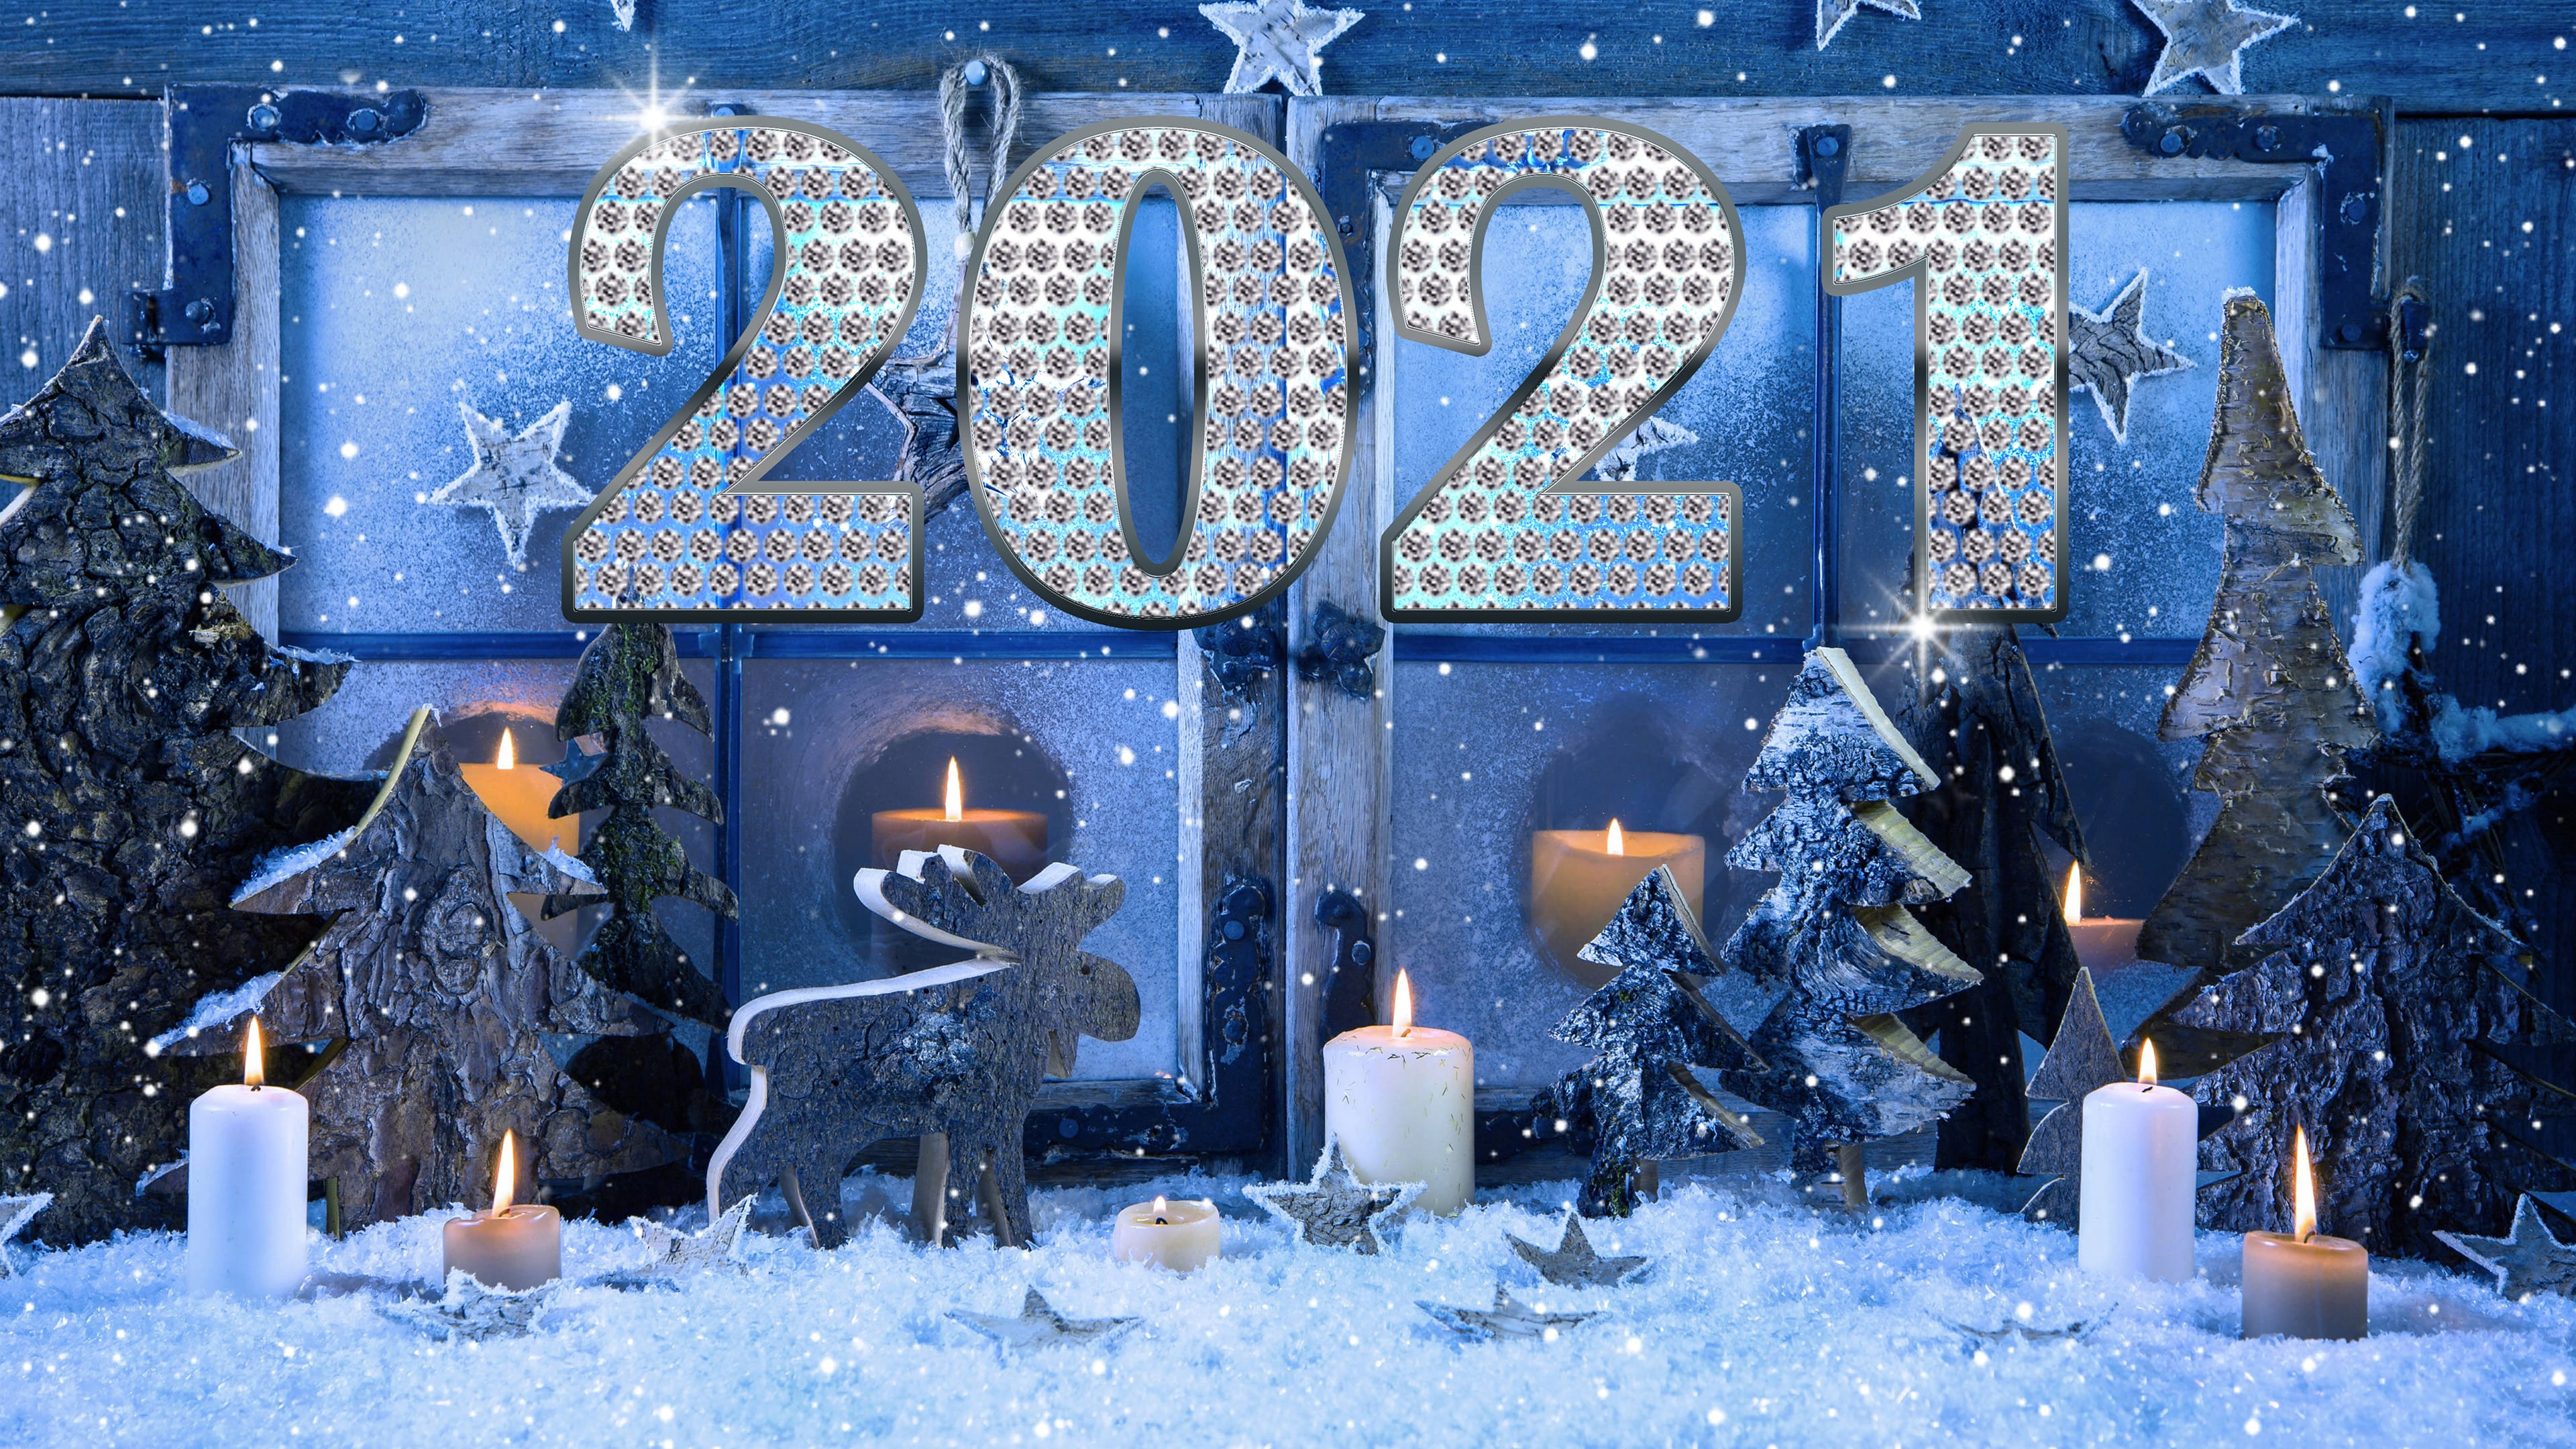 HDoboi.Kiev.ua - Новогодний декор к Новому 2021 году, обои про Новый год 2021